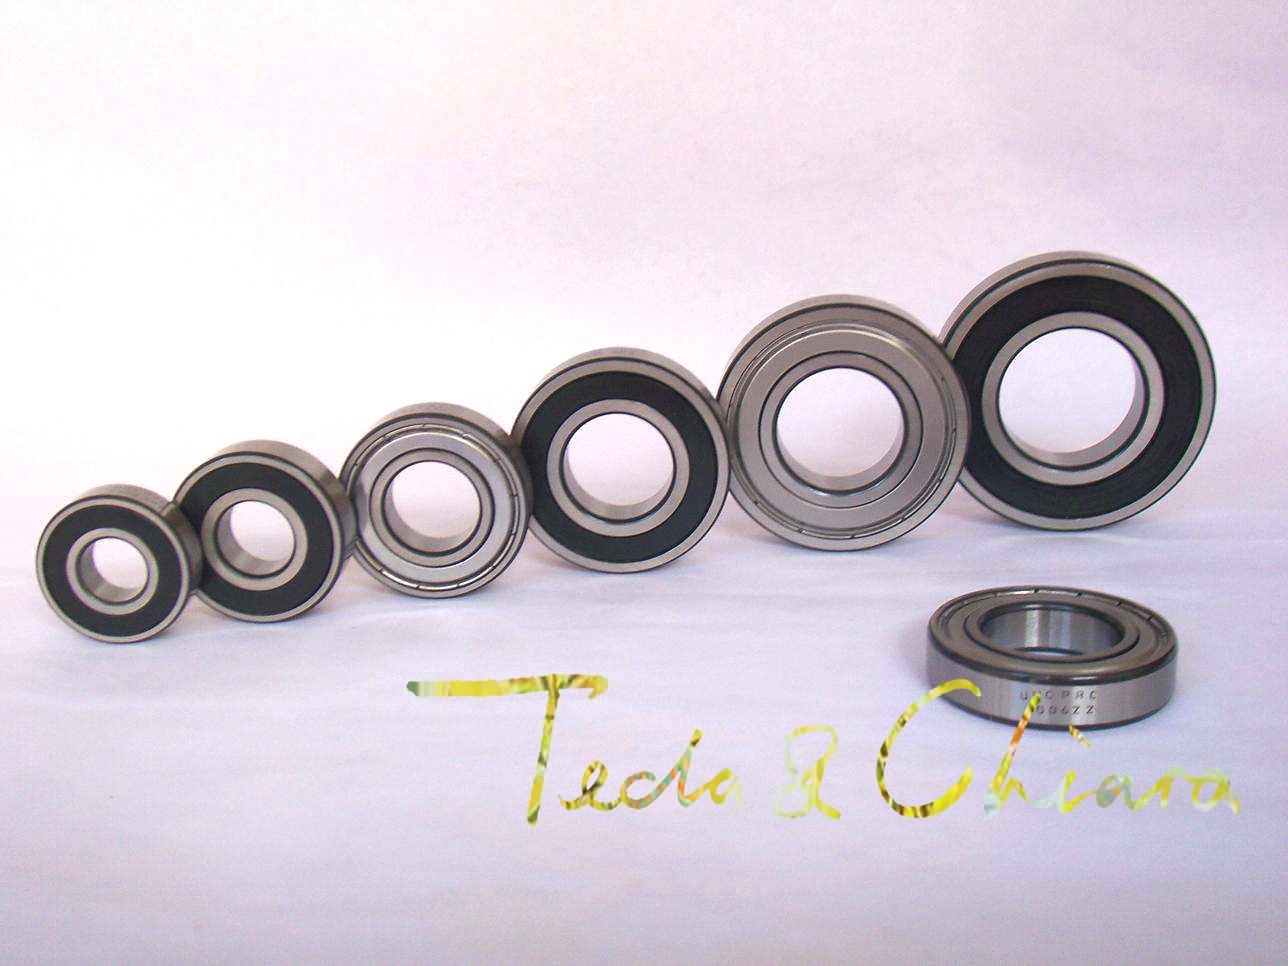 608 608ZZ 608RS 608-2Z 608Z 608-2RS ZZ RS RZ 2RZ Deep Groove Ball Bearings 8 x 22 x 7mm High Quality mr74 674zz 674rs mr74zz mr74rs mr74 2z mr74z mr74 2rs 674 674z zz rs rz 2rz deep groove ball bearings 4 x 7 x 2 5mm high quality